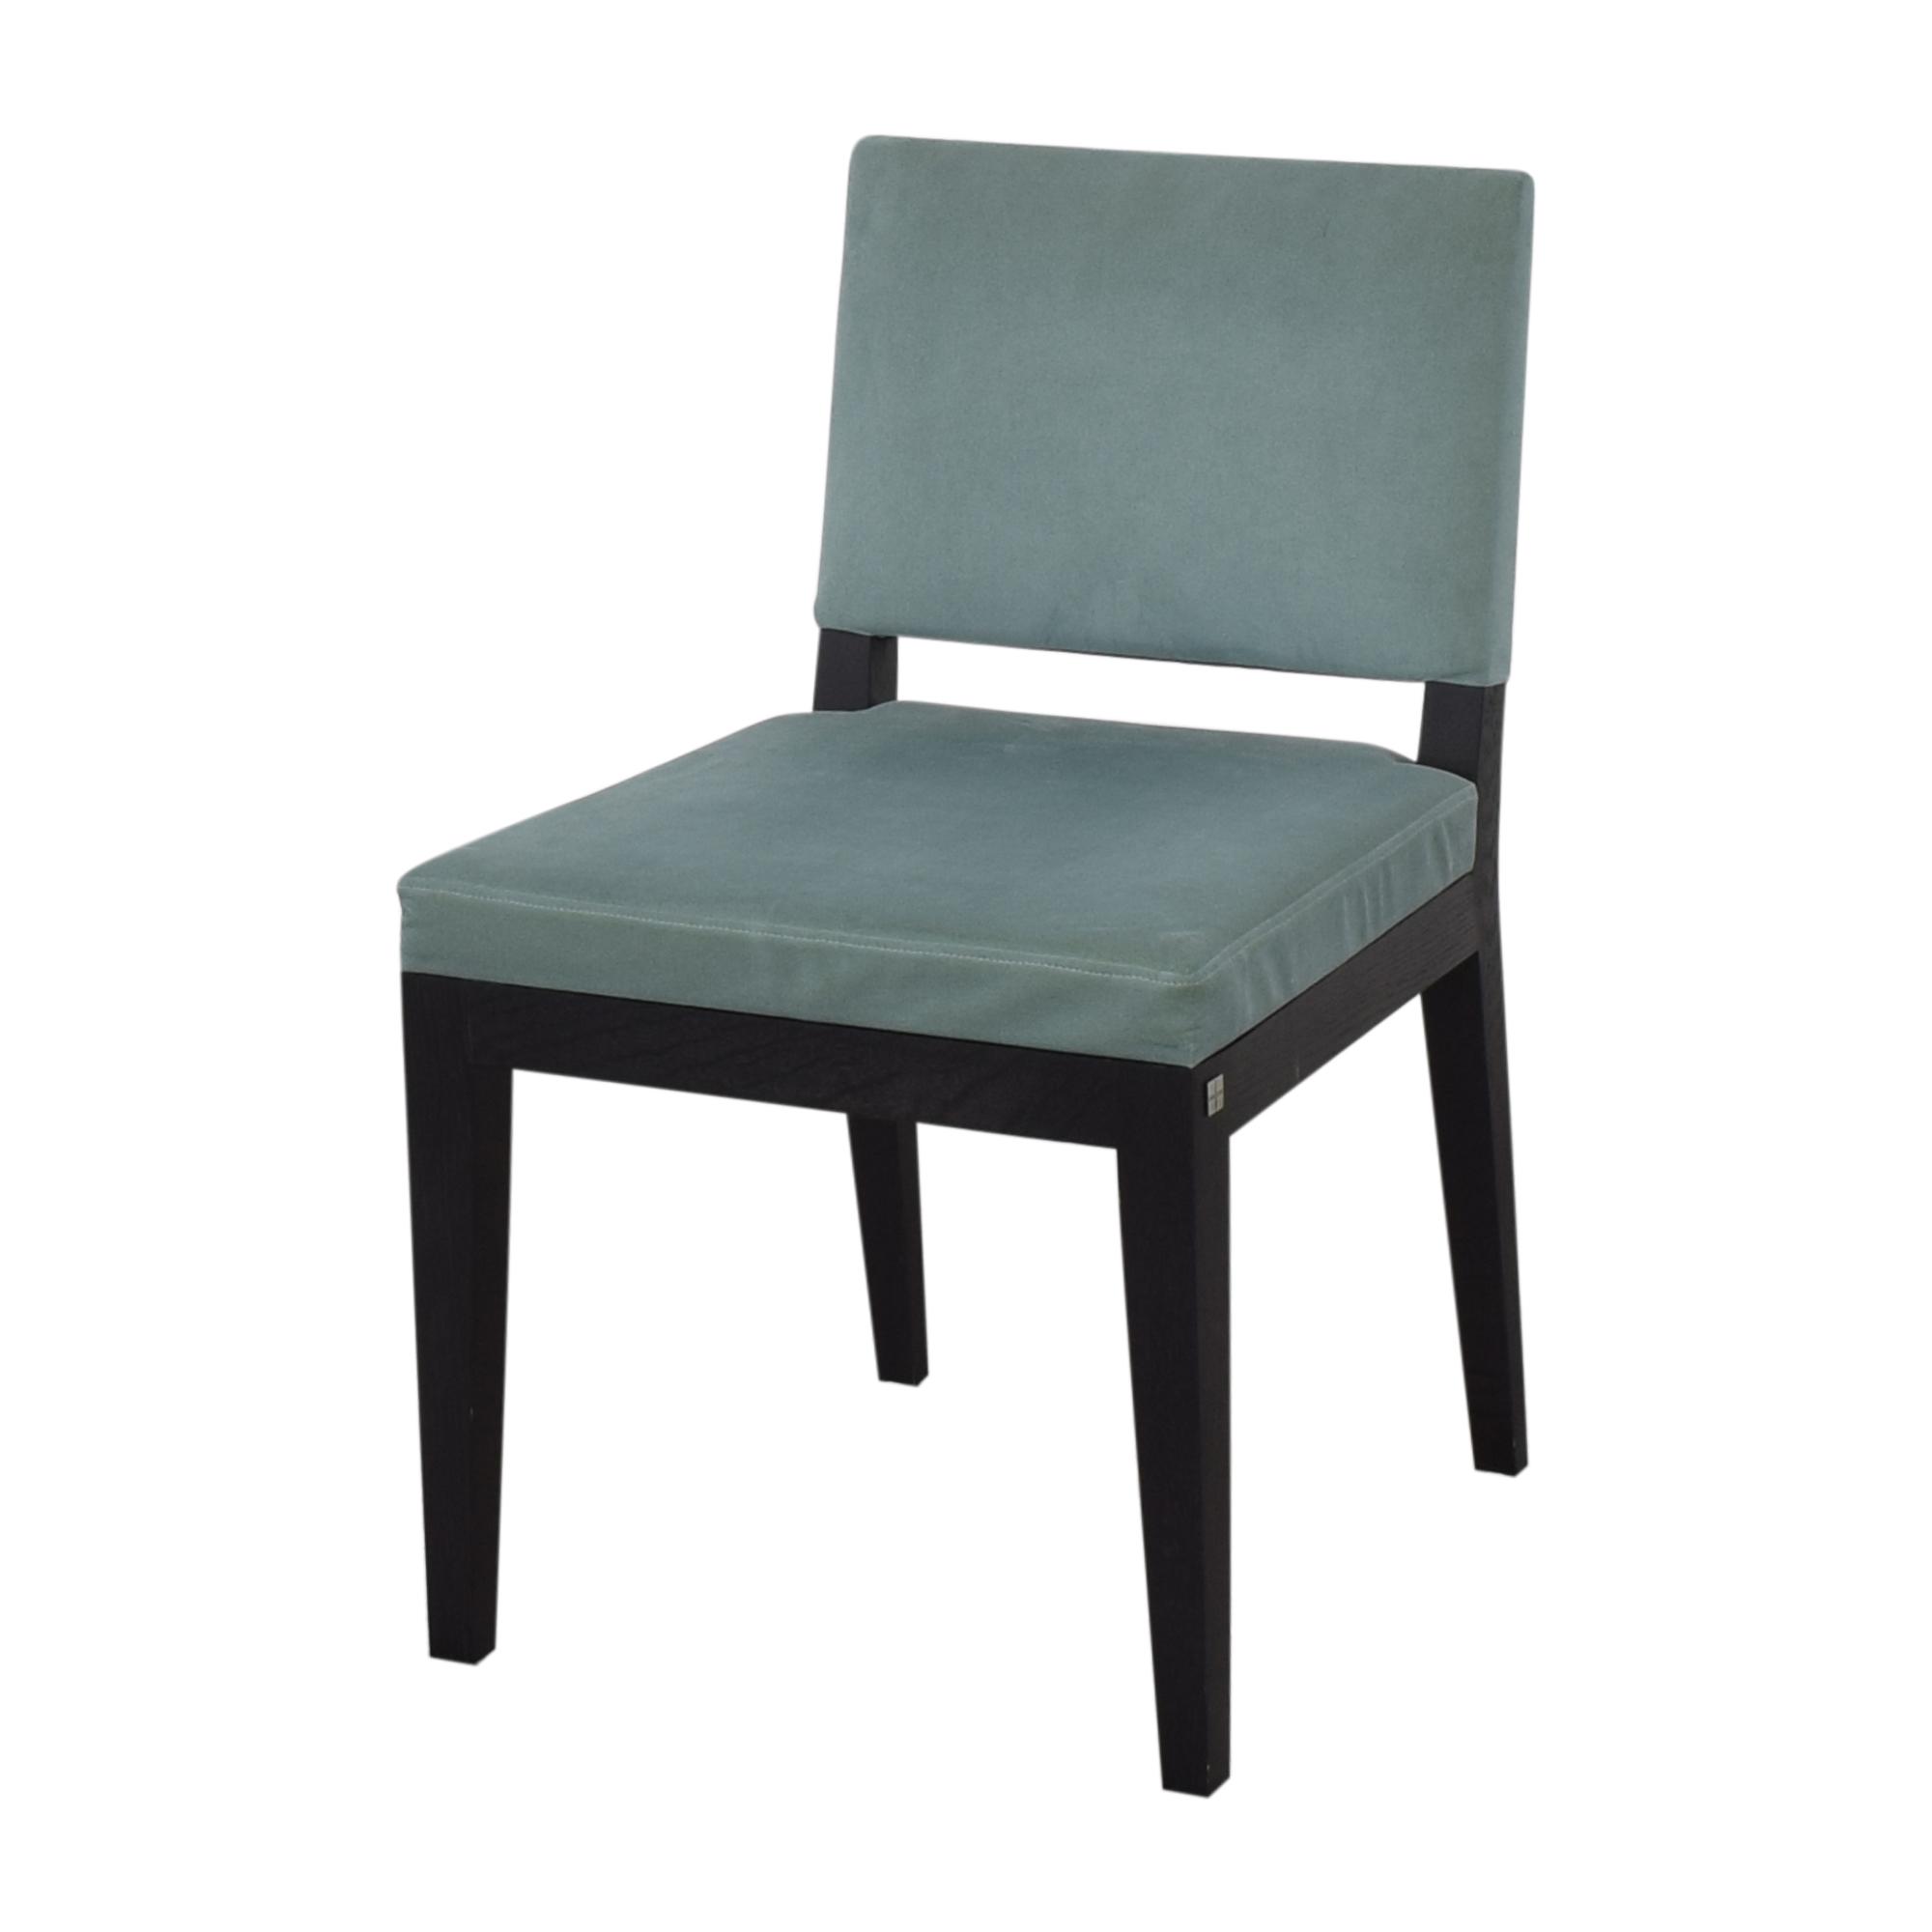 Desiron Desiron Turner Dining Chairs discount